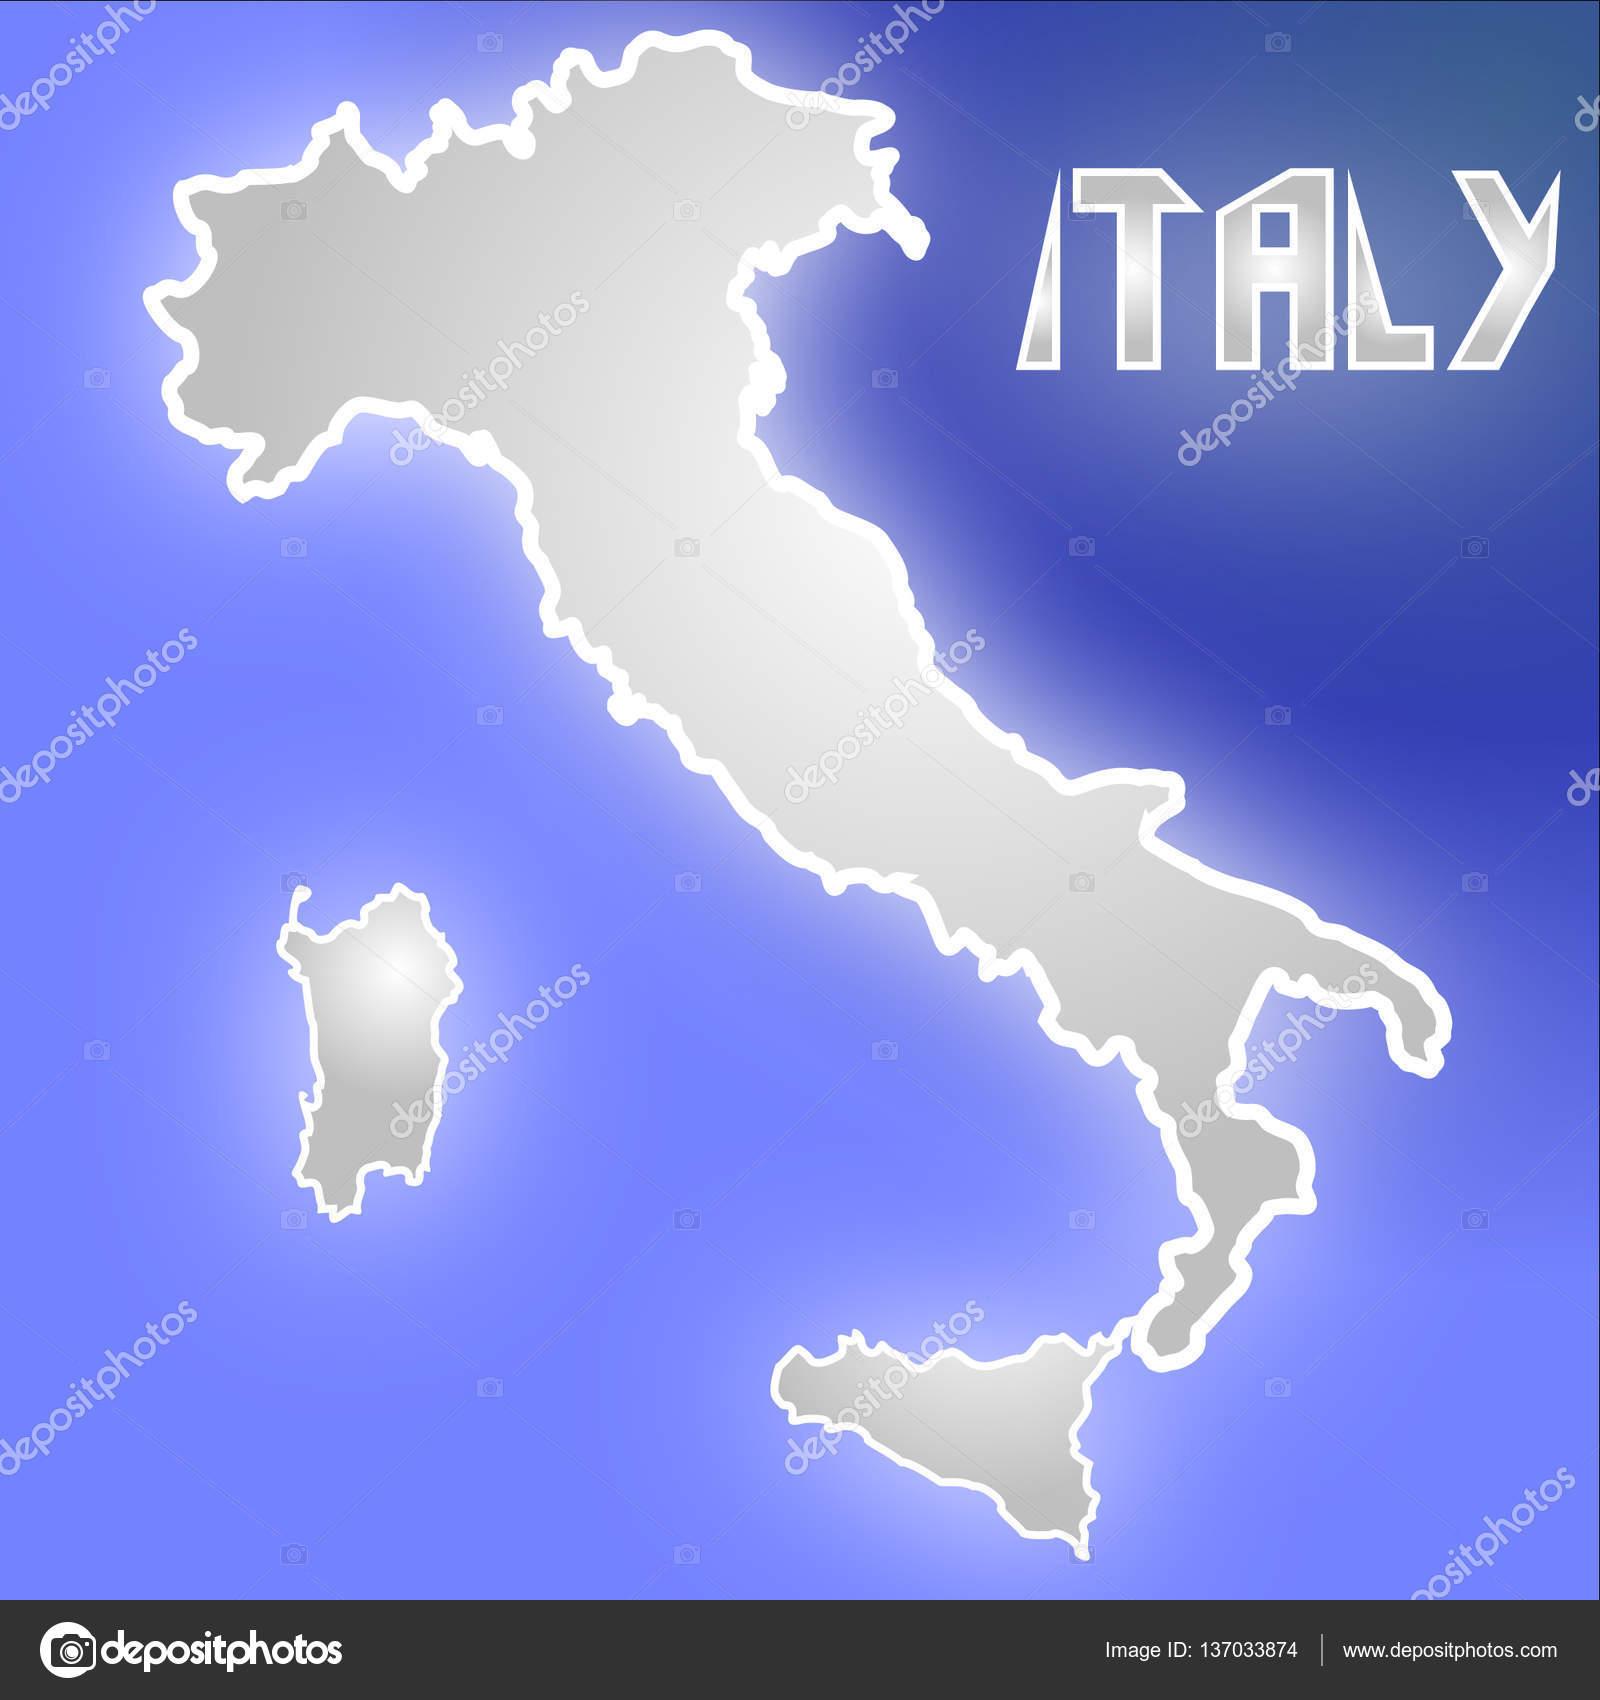 Nice Italy Map Stock Photo C Truman43 137033874